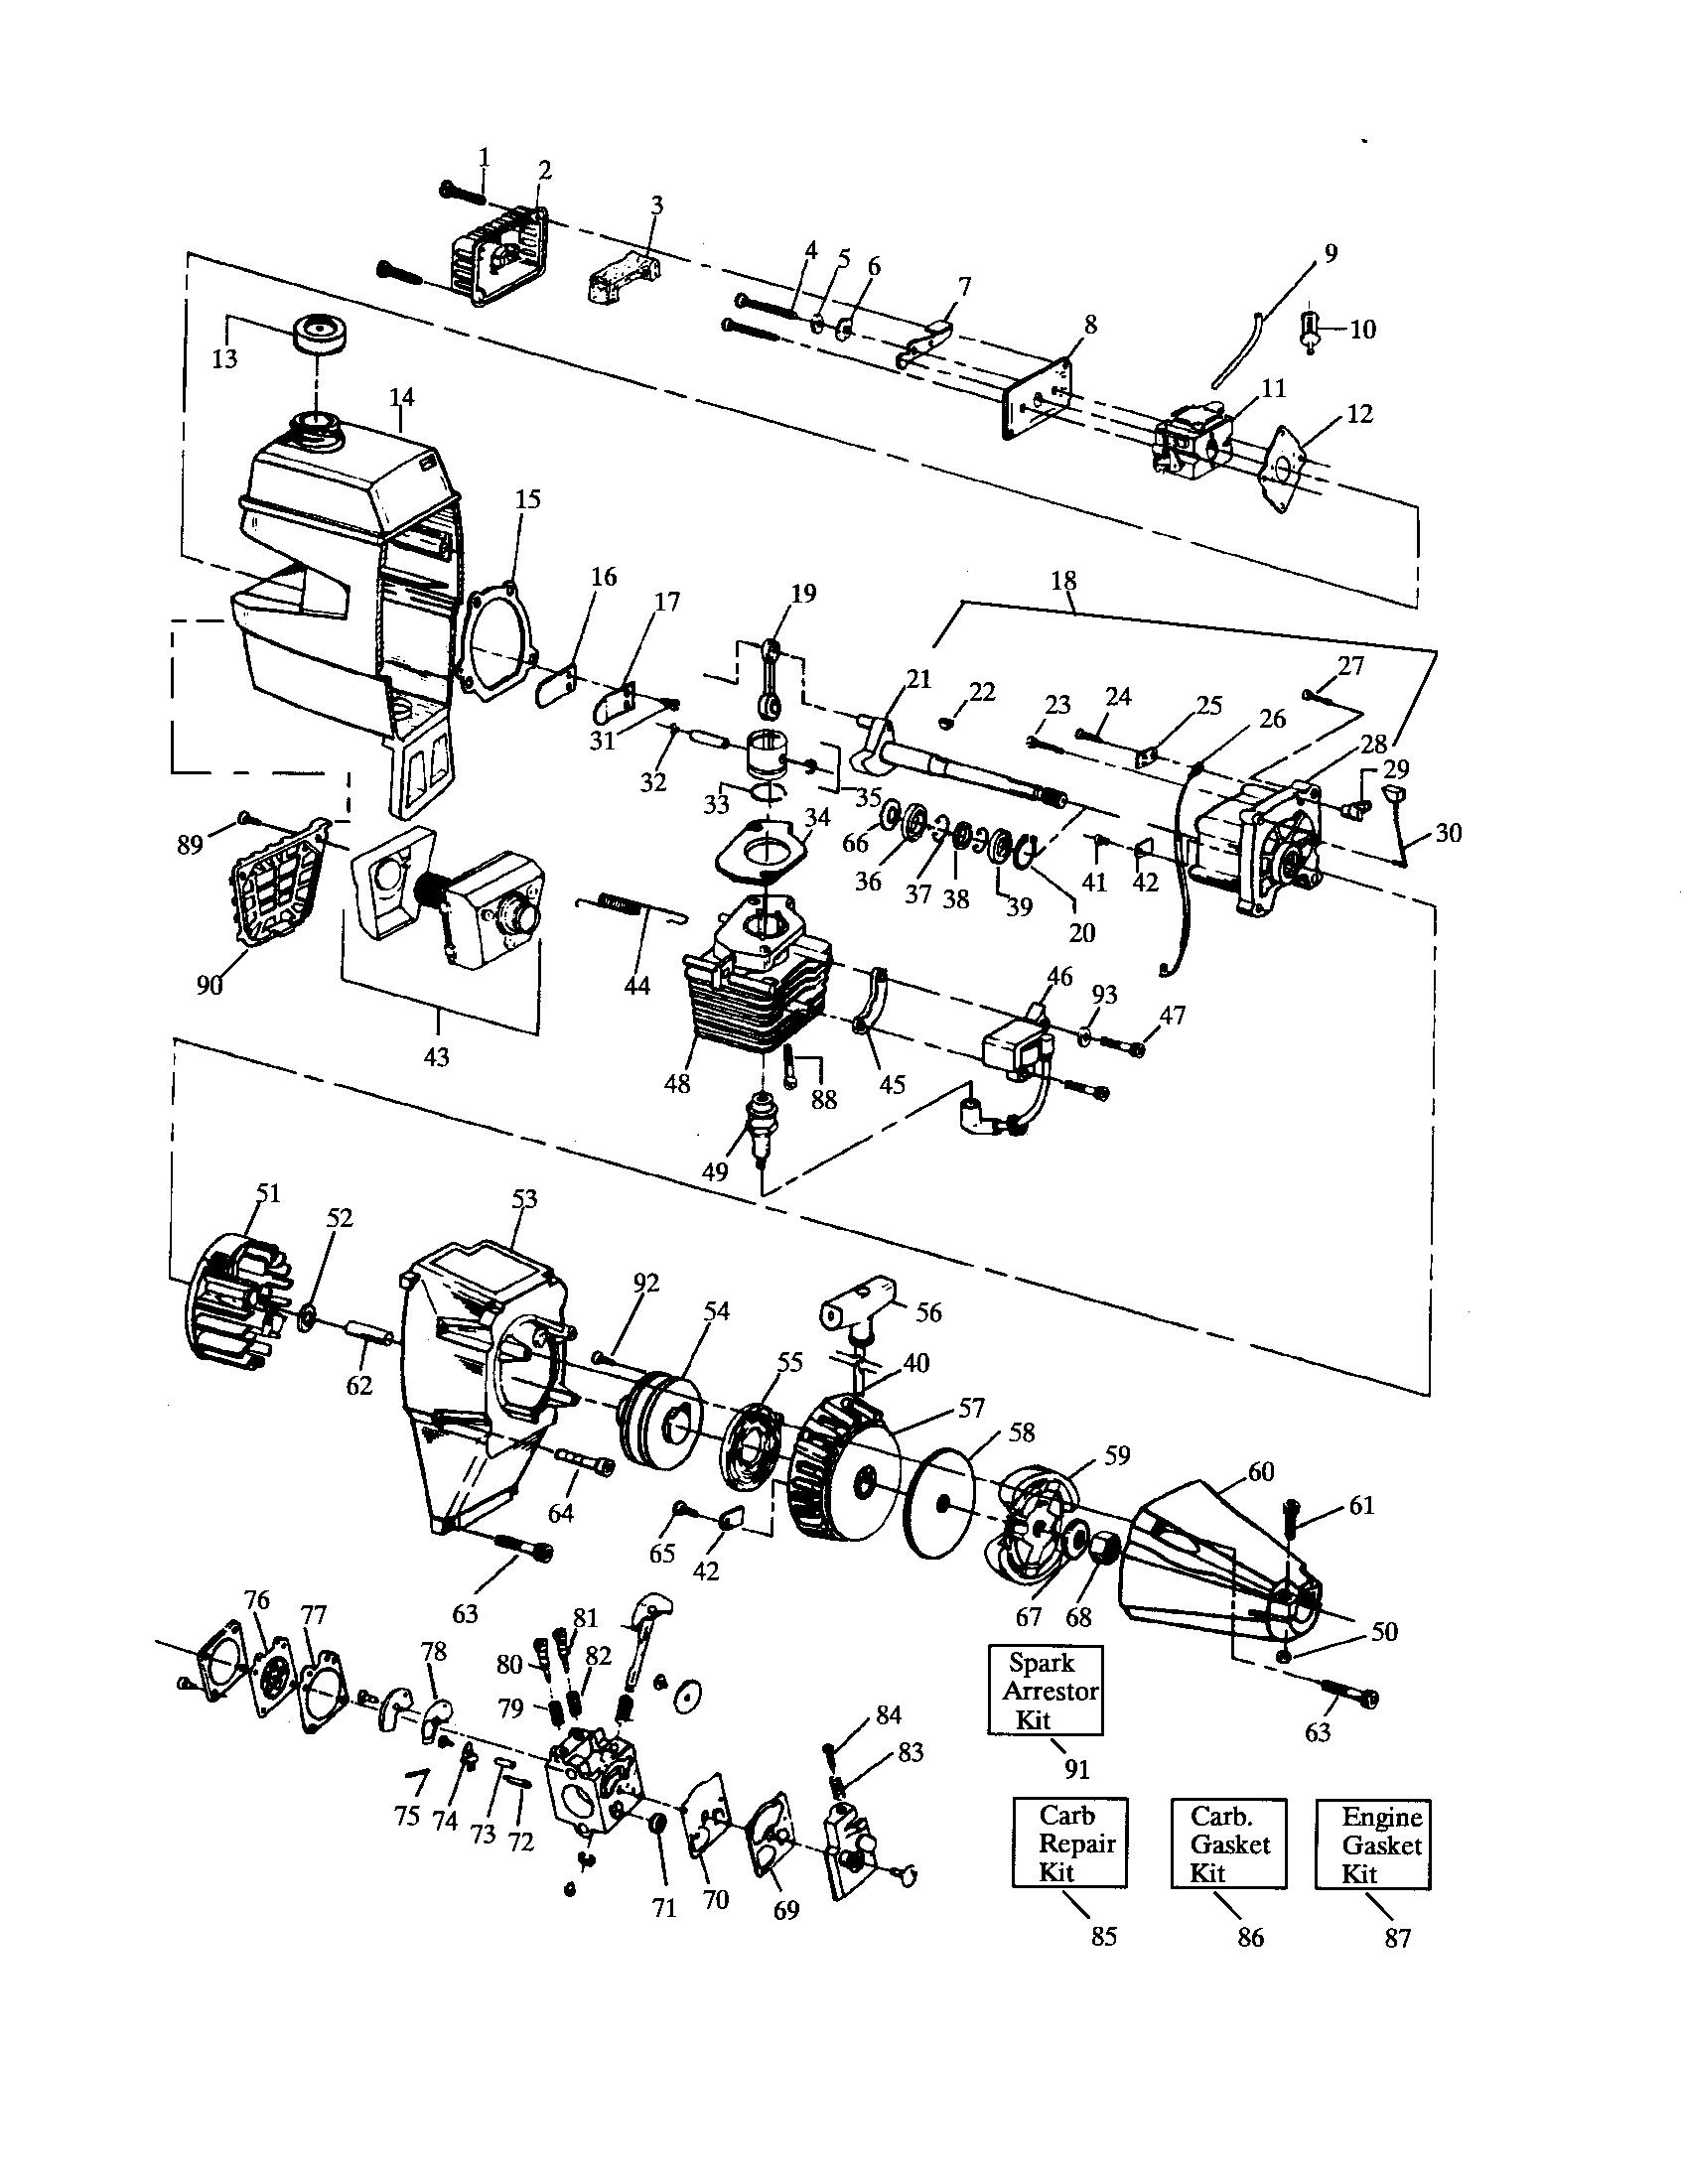 Craftsman model 358797121 line trimmers weedwackers gas genuine parts rh searspartsdirect craftsman chainsaw carburetor fuel line diagram craftsman 36cc